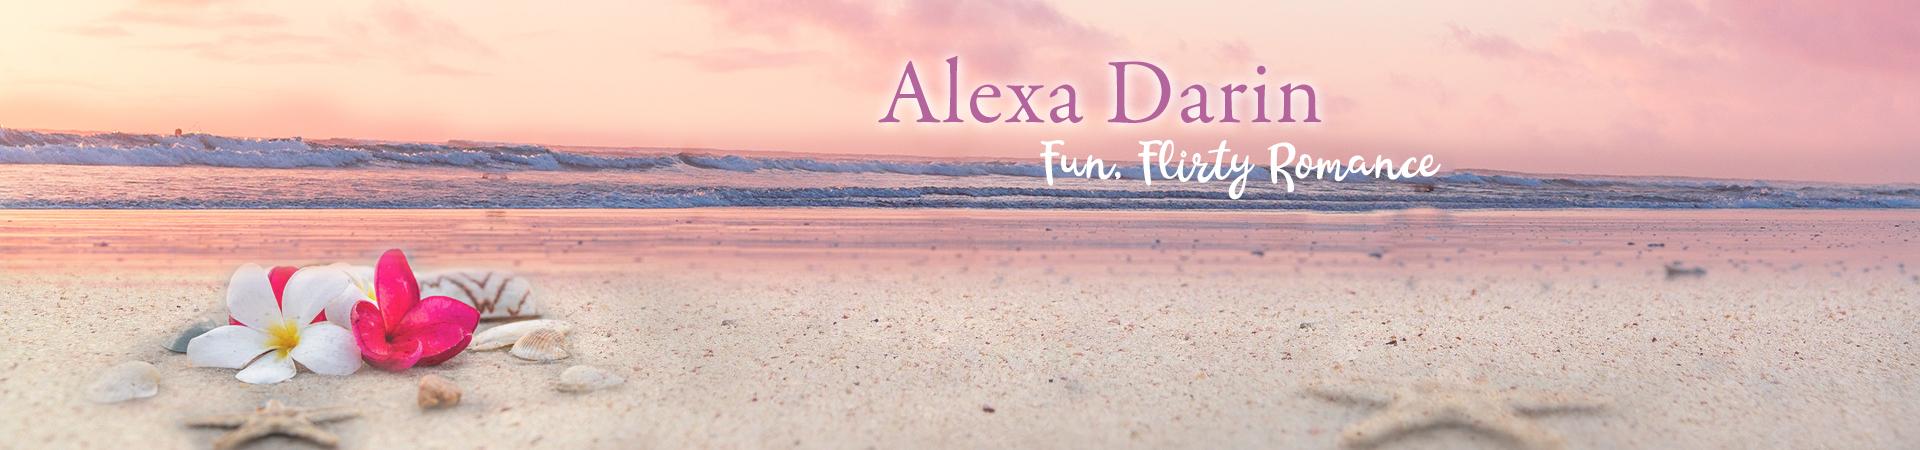 Author Alexa Darin